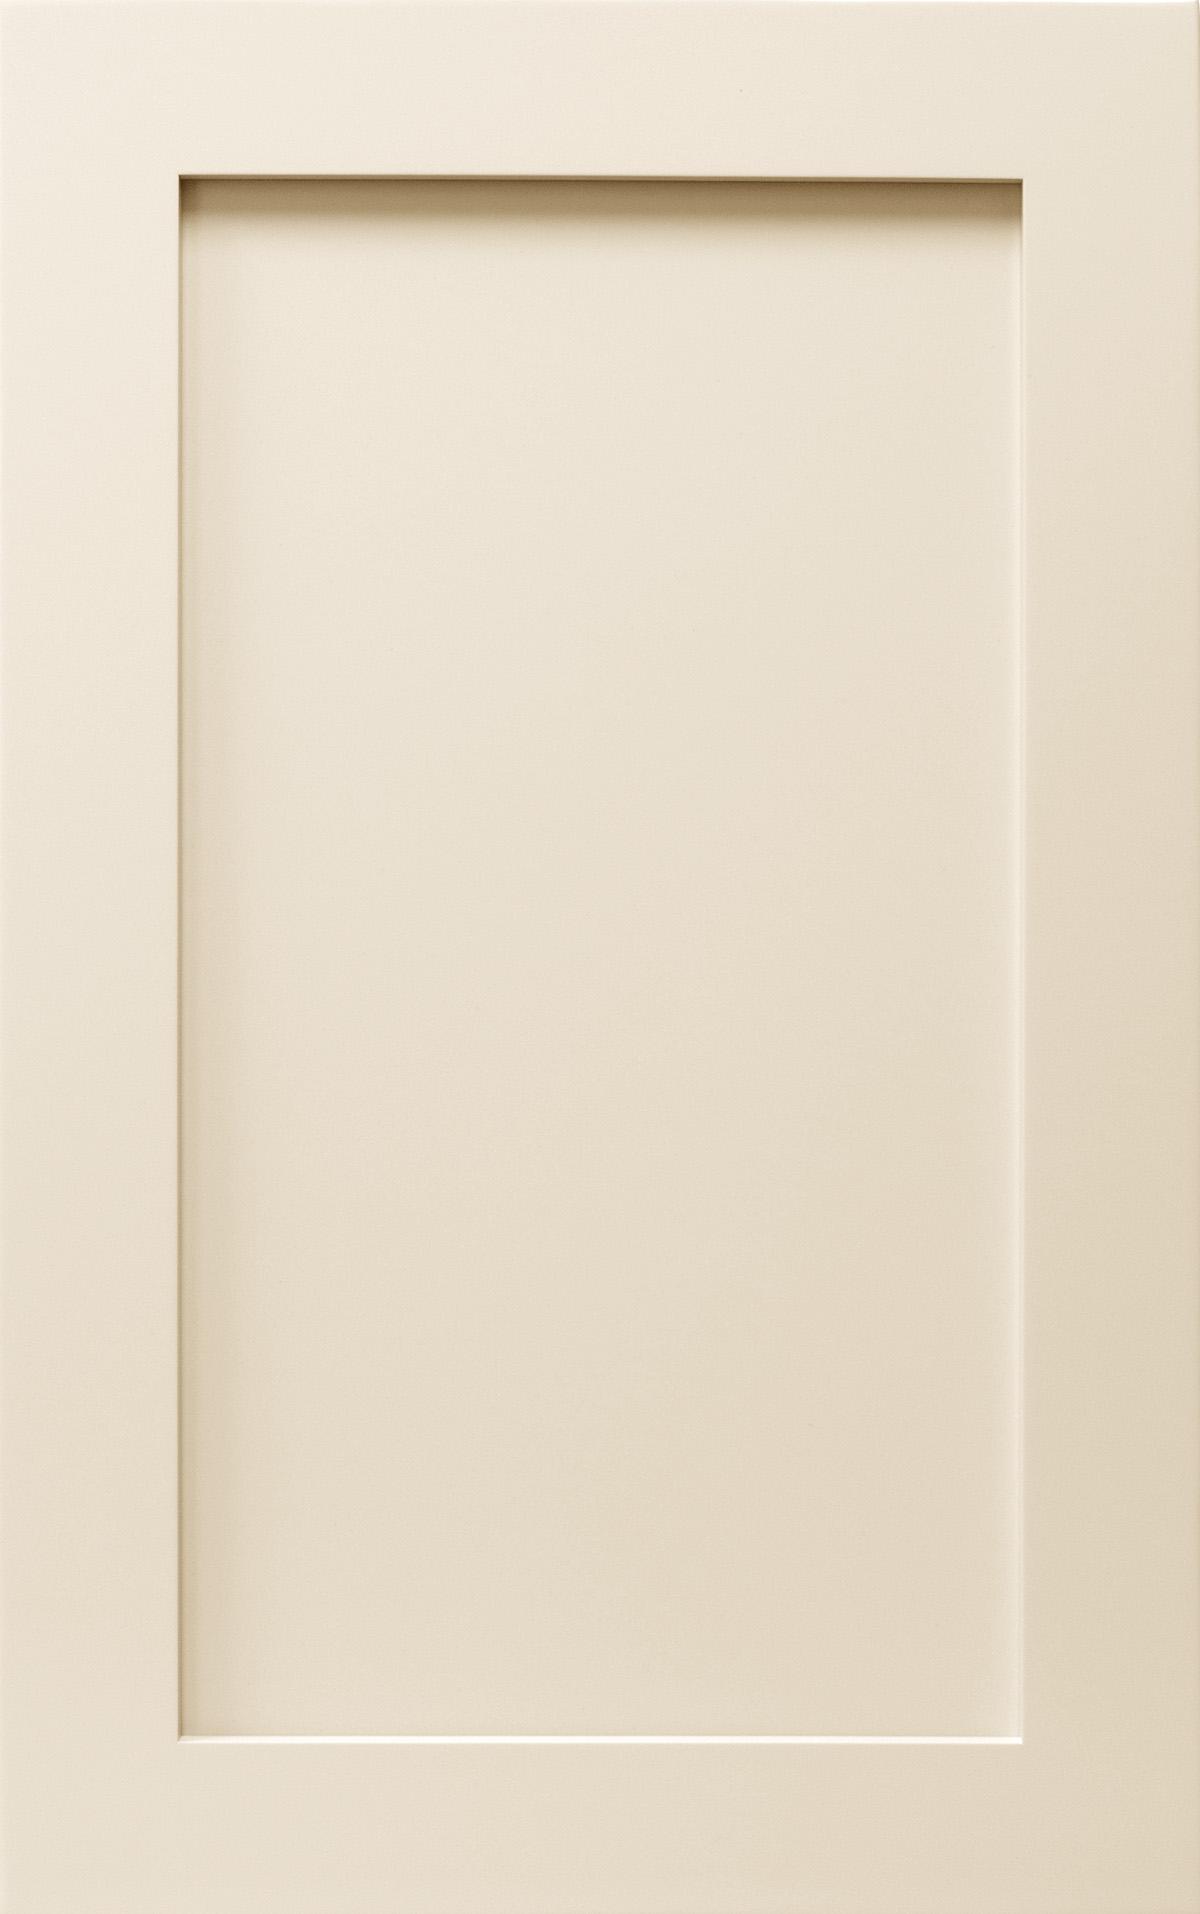 Vinings Flat-Floral White